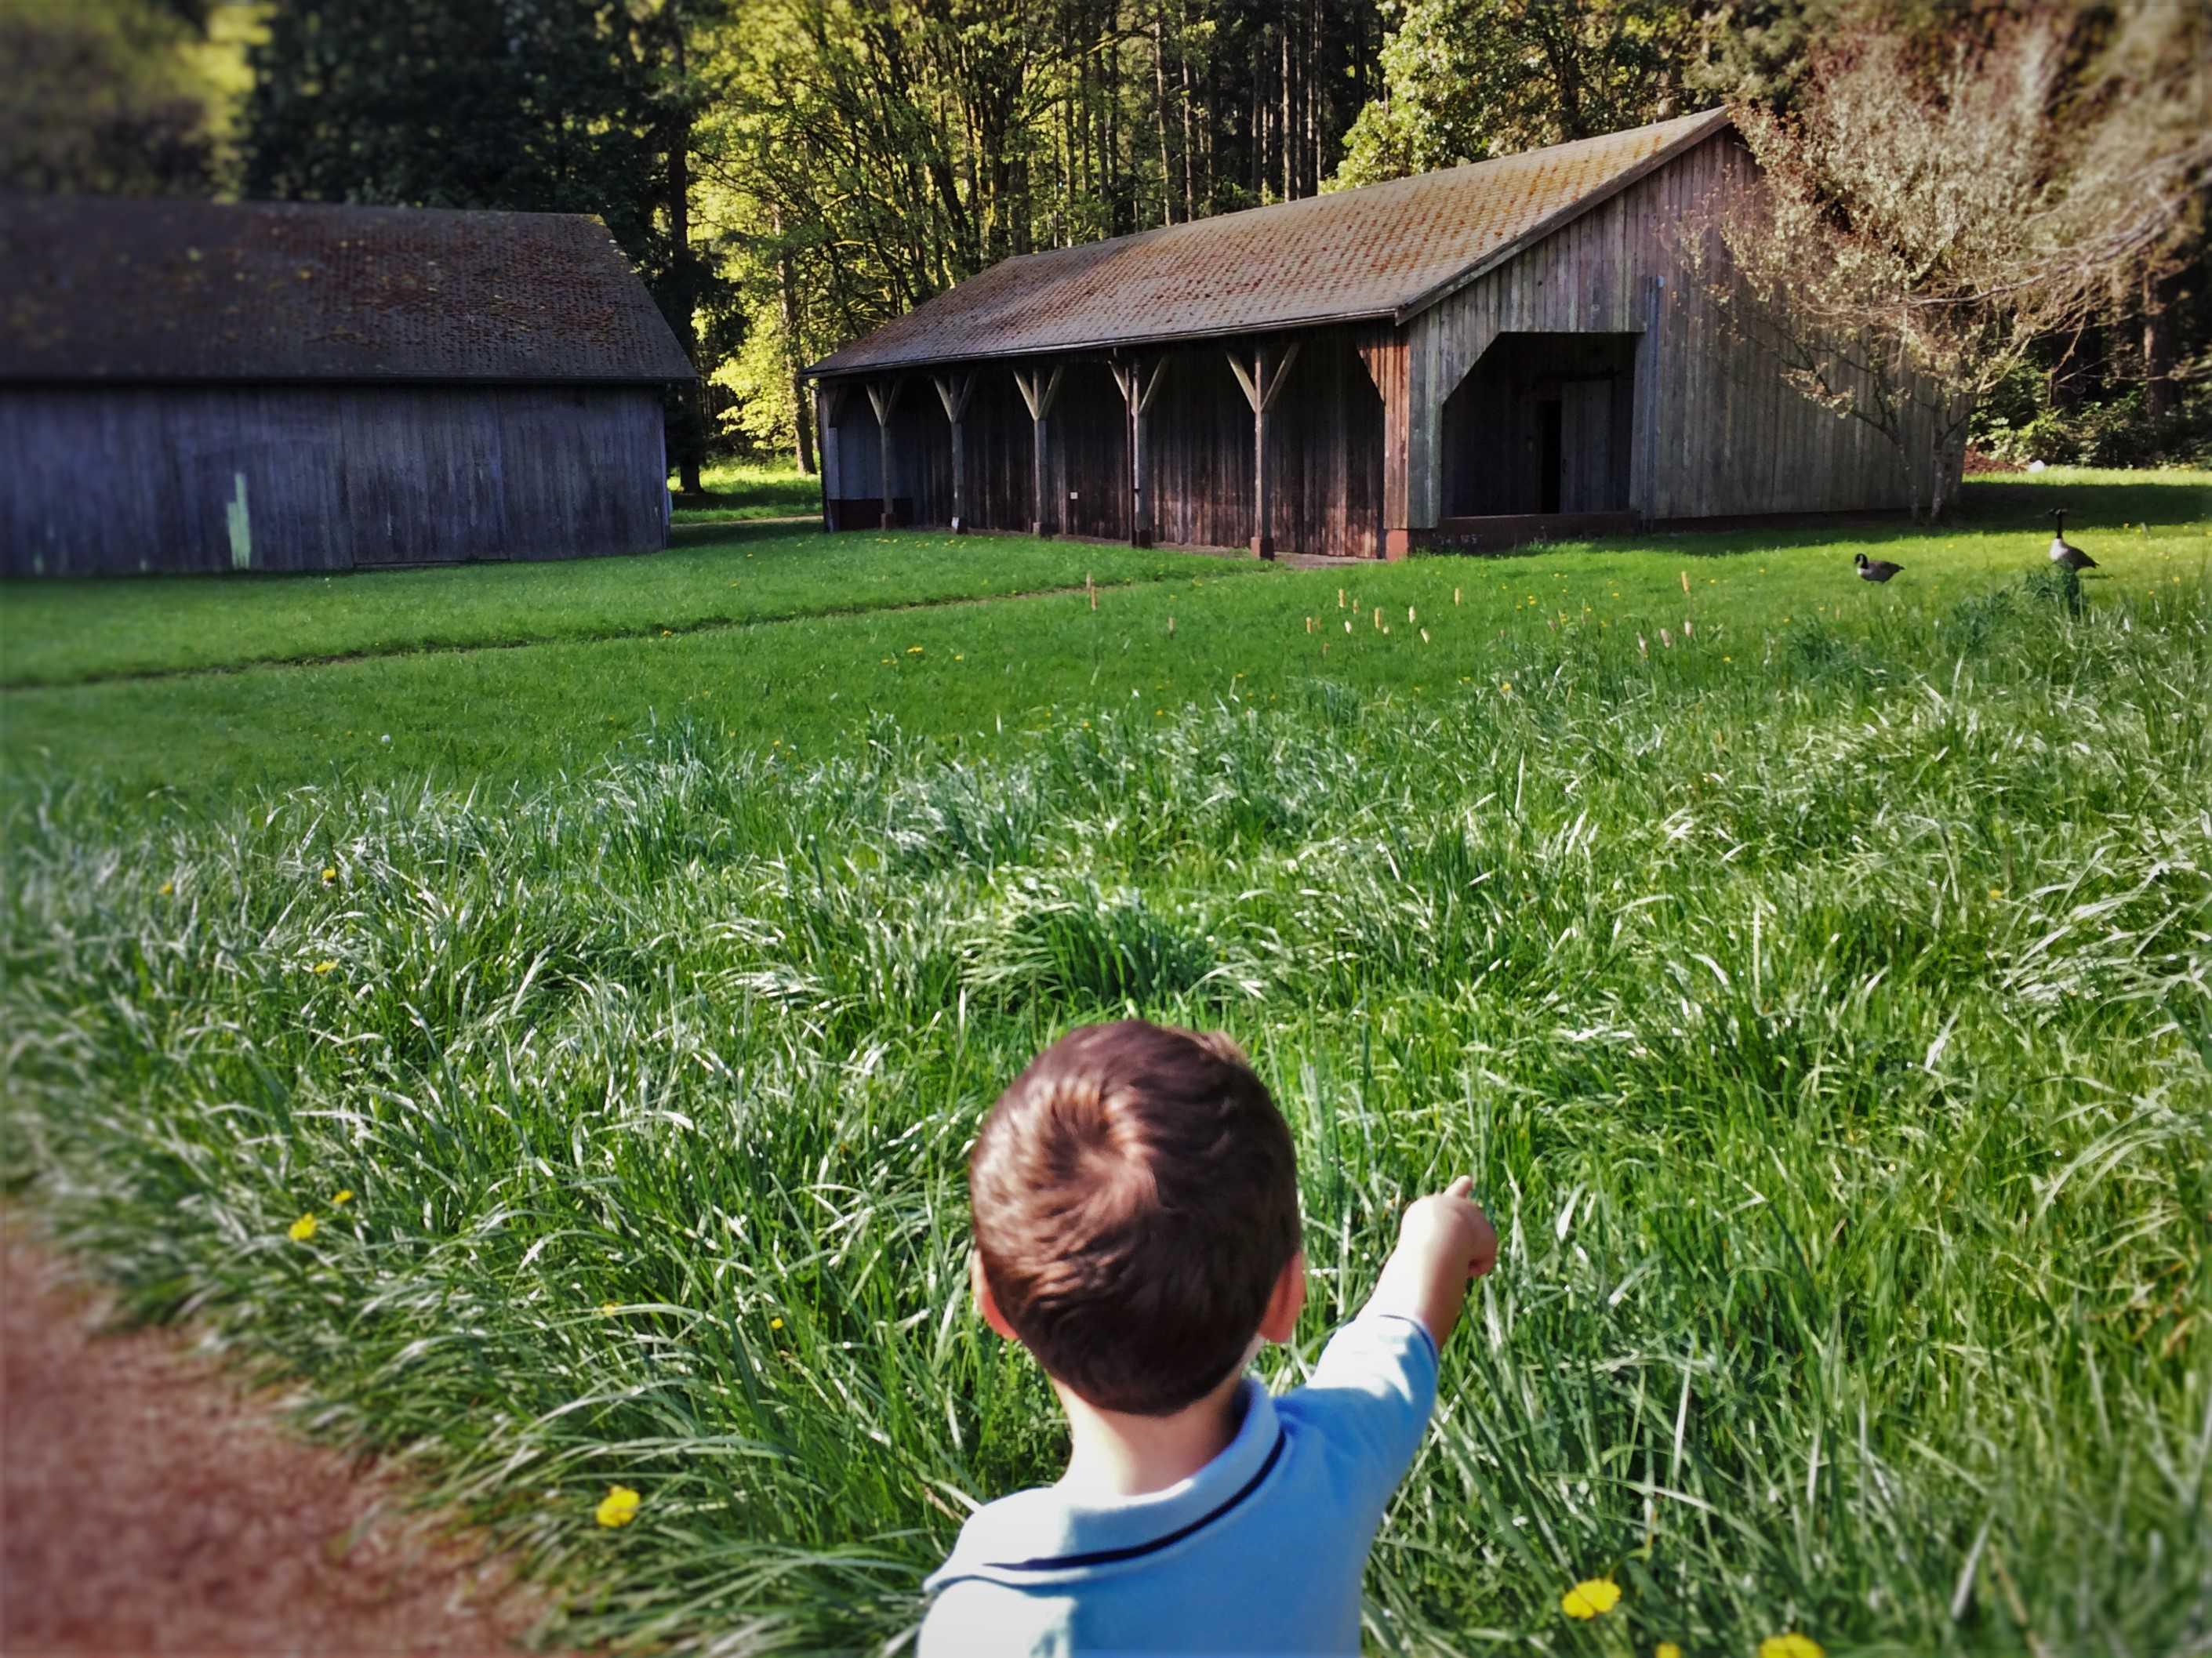 LittleMan and Sheep barn at Bloedel Reserve Bainbridge Island 1